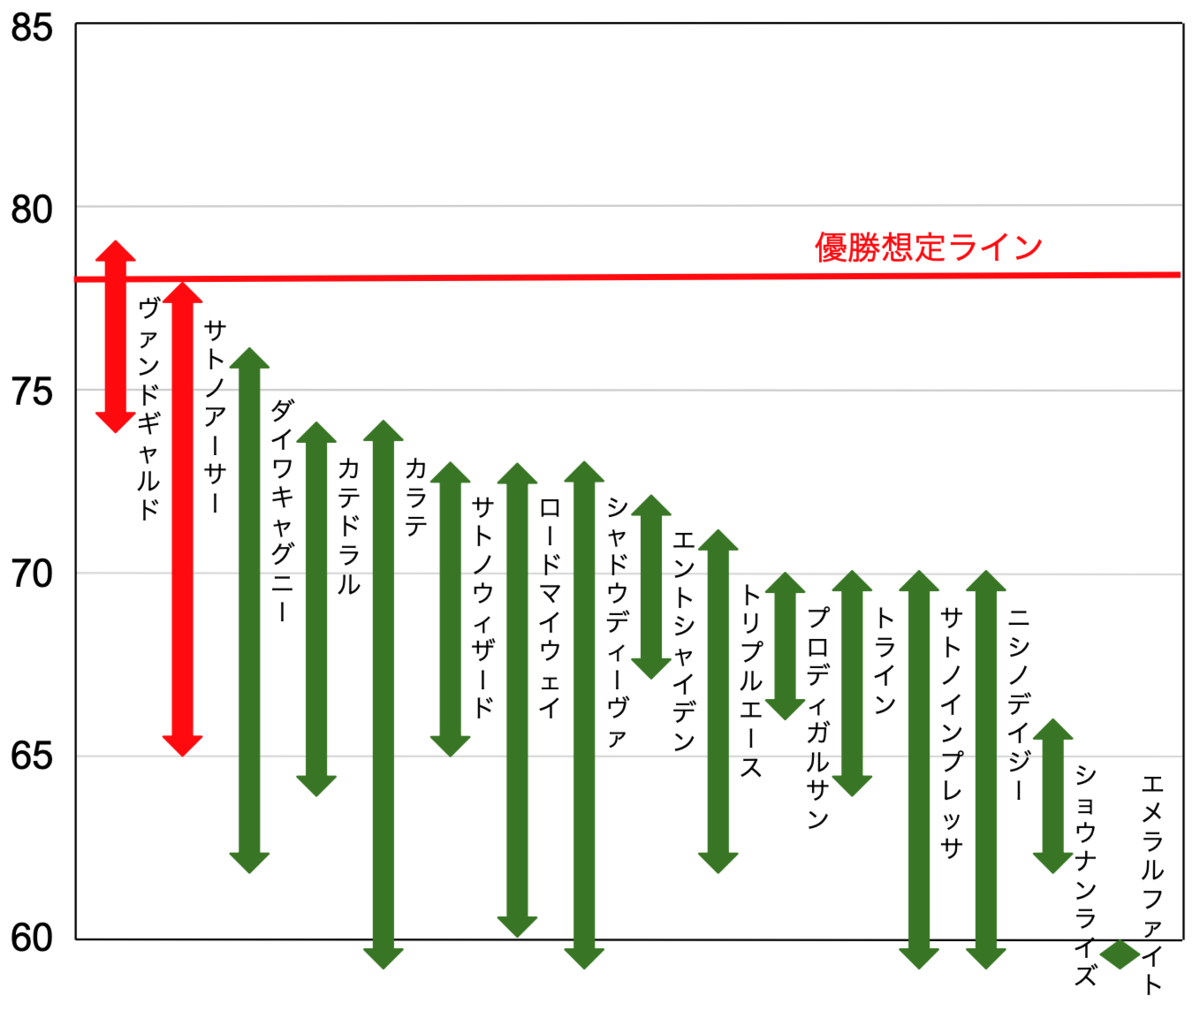 f:id:keibashisuu:20210206133155p:plain